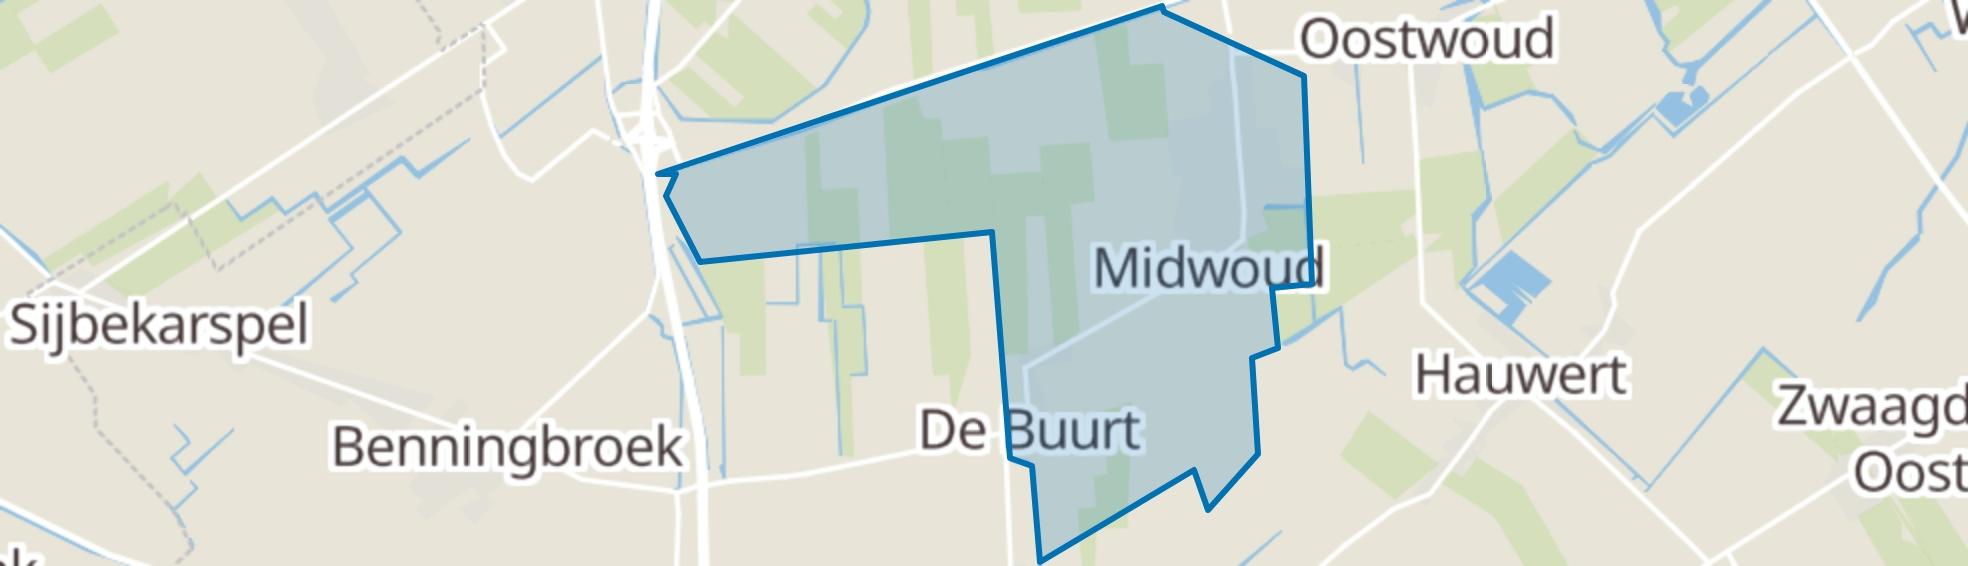 Midwoud map